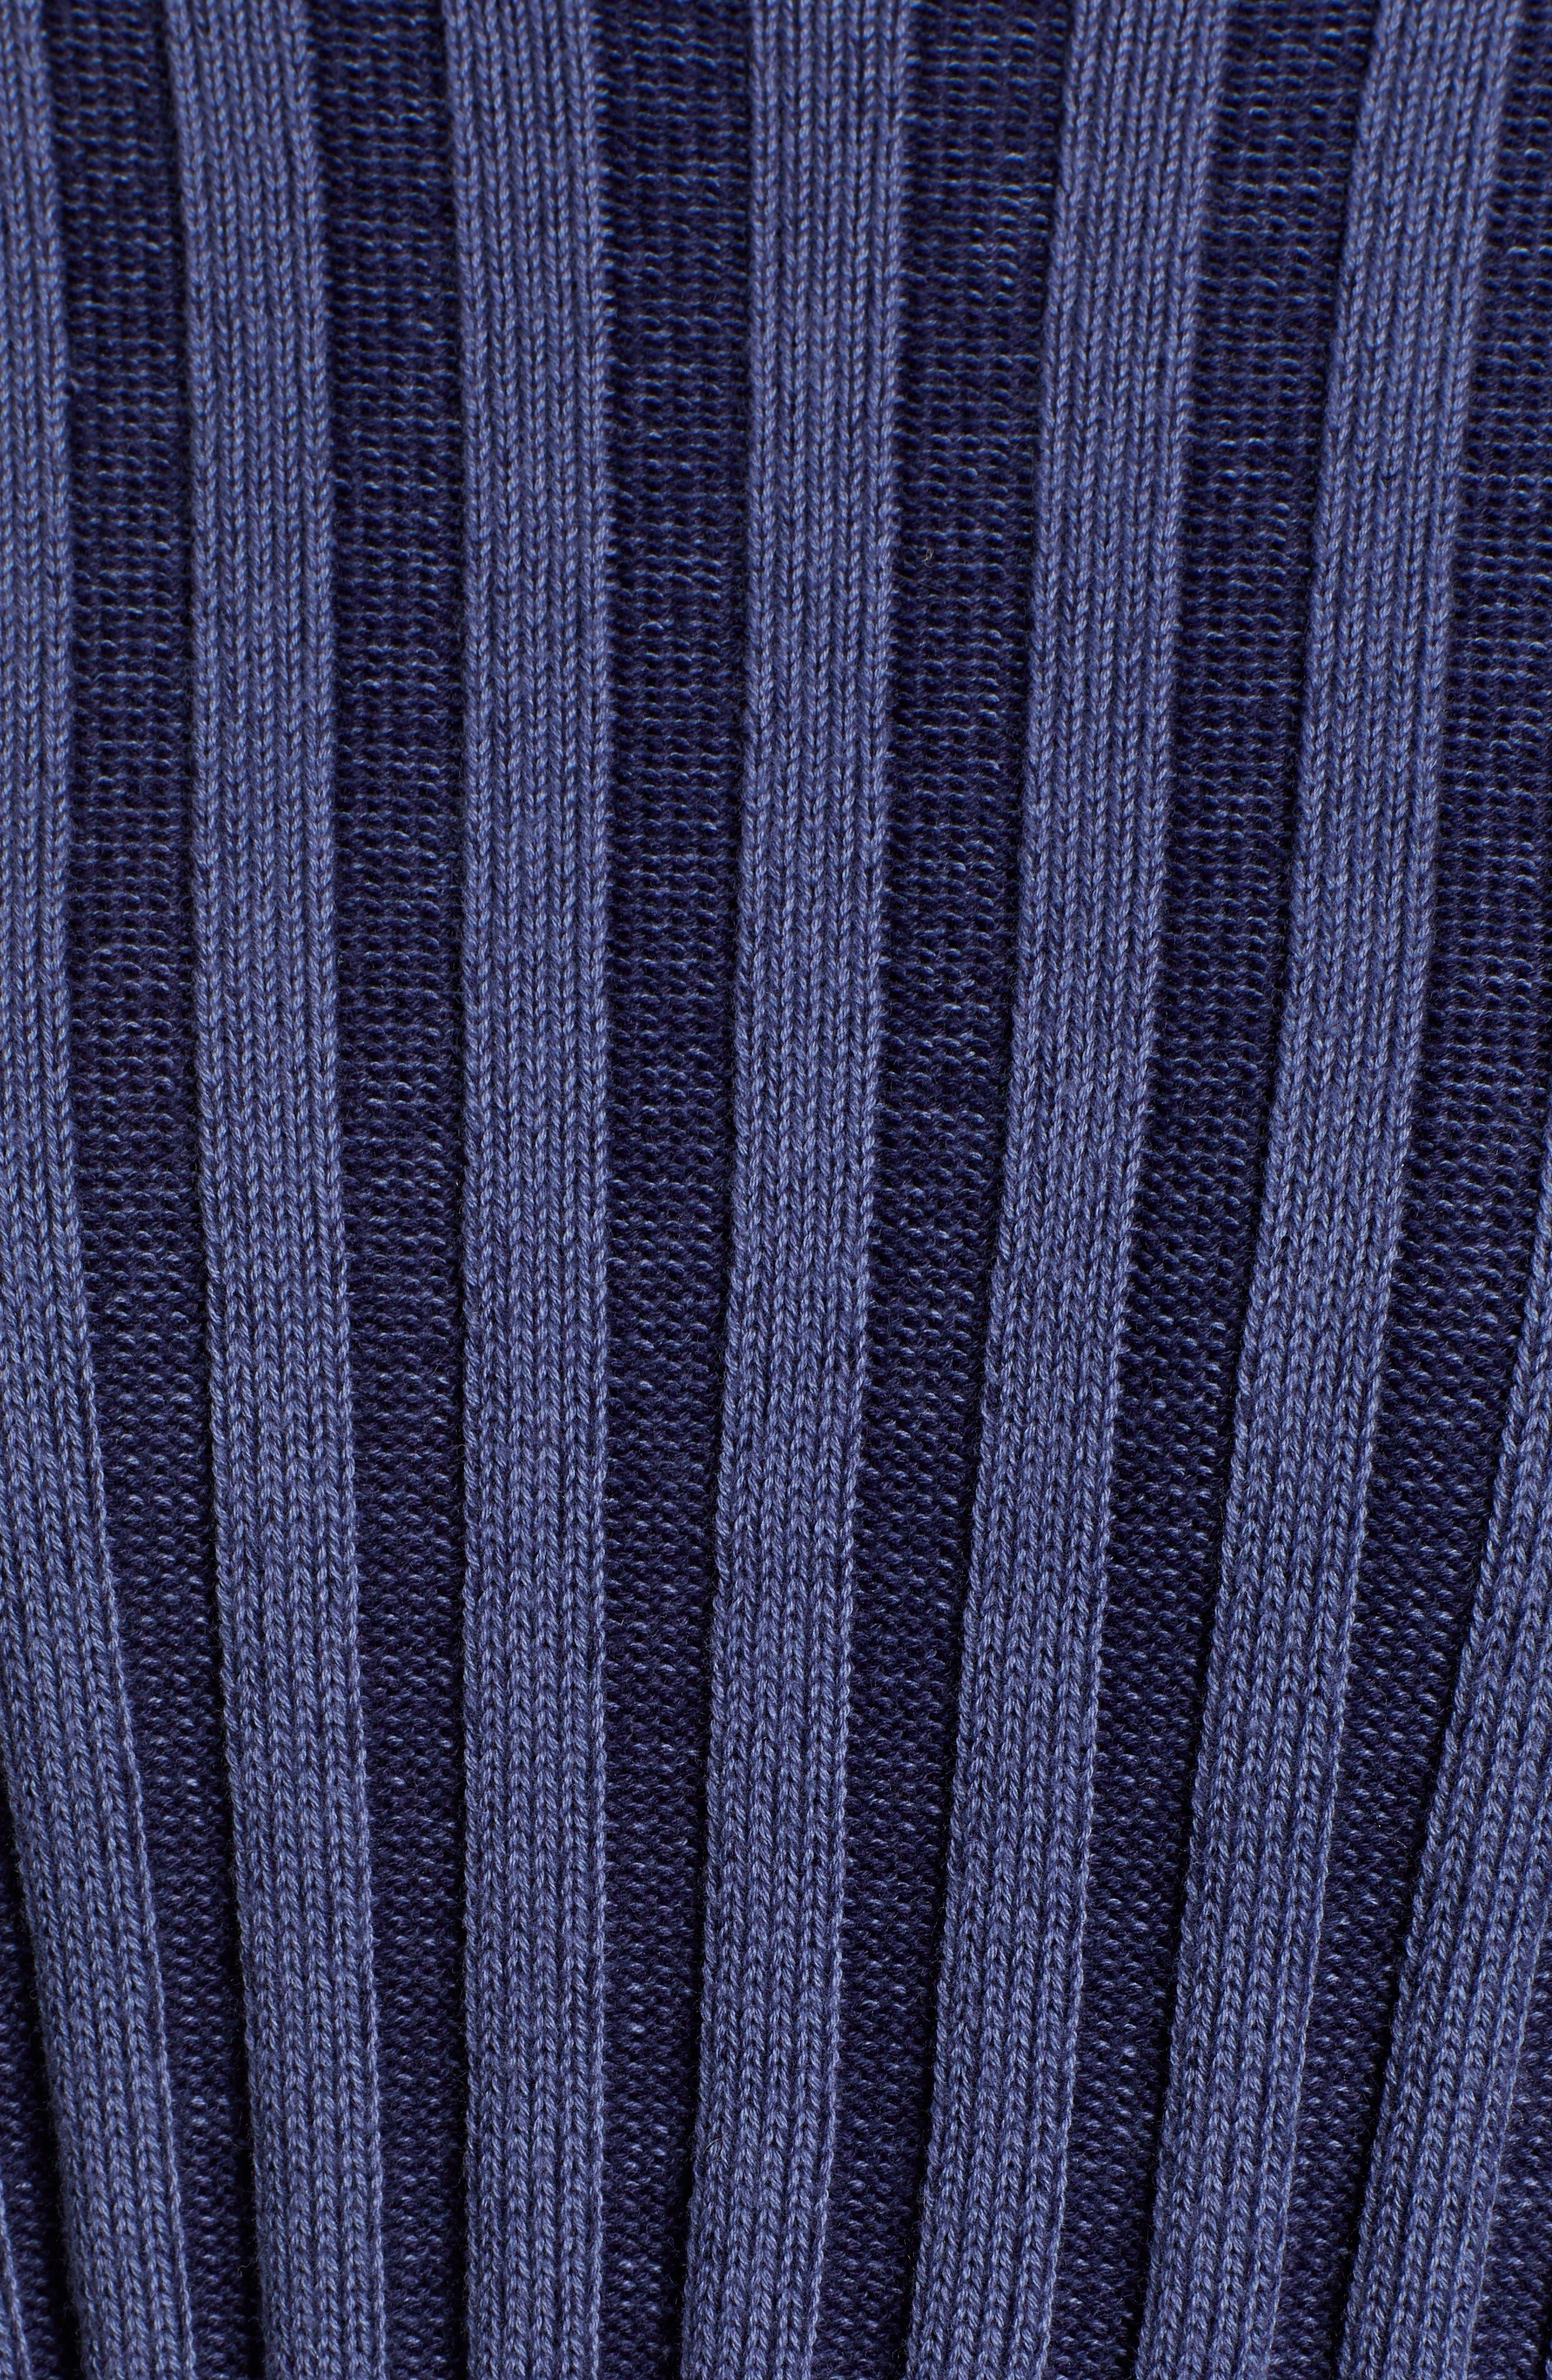 Shadow Rib Crop Sweater,                             Alternate thumbnail 6, color,                             NAVY EVENING